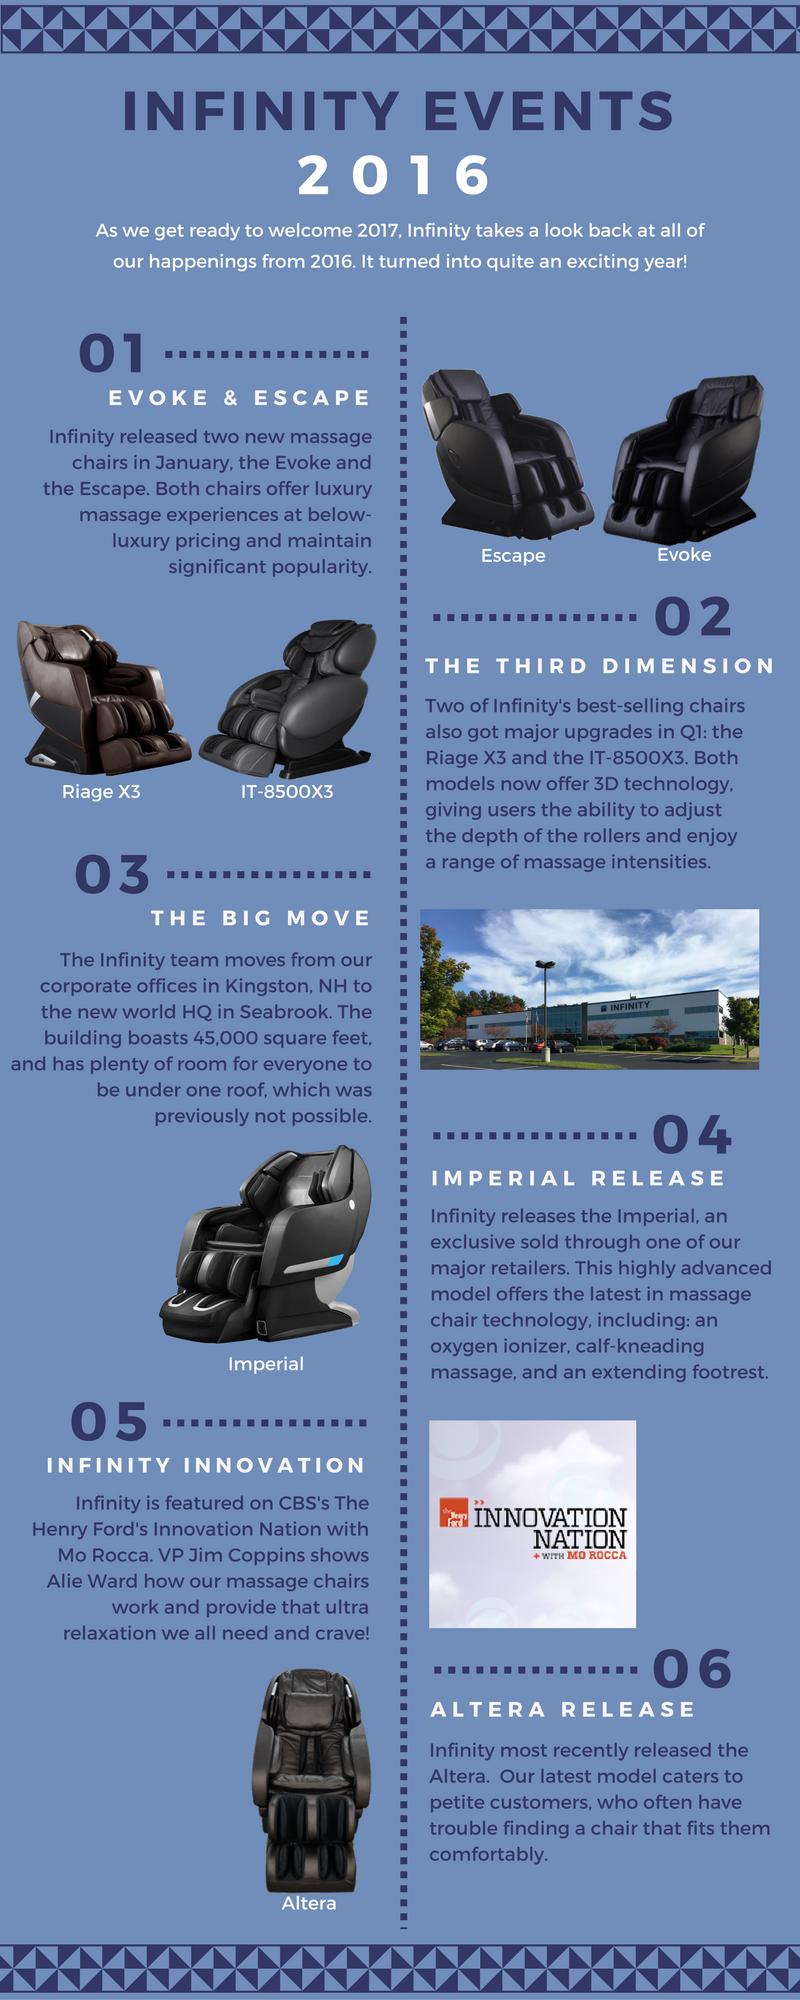 Infinity Massage Chairs, Infinity Massage Chairs News, Infinity Massage Chairs updates